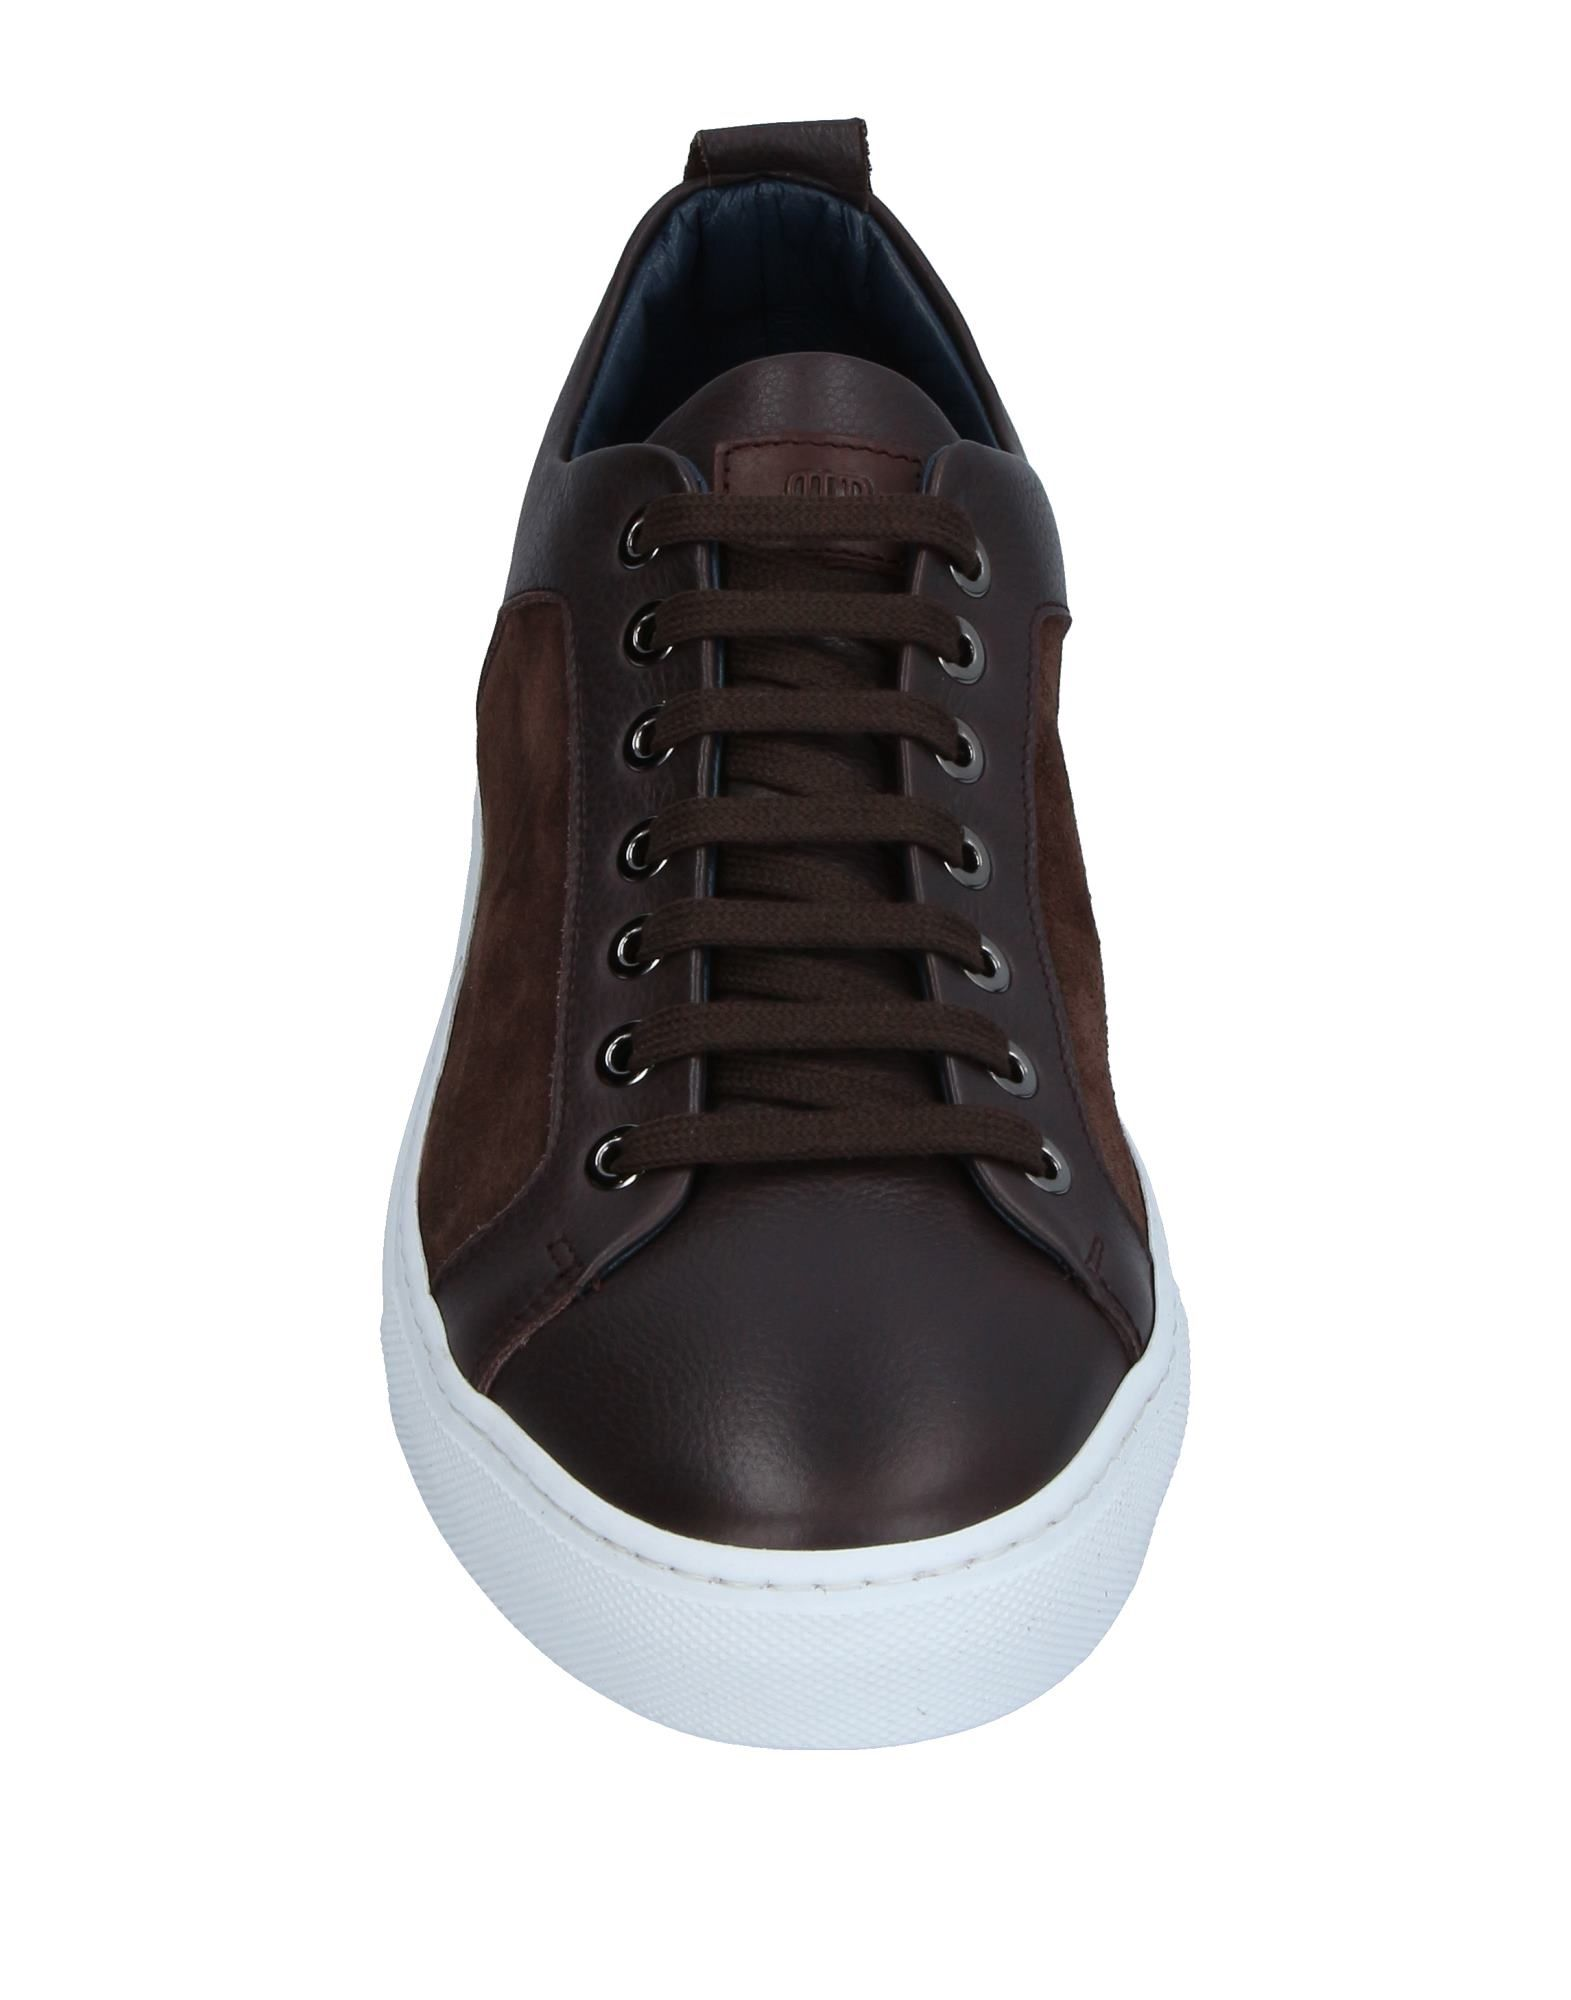 Rabatt echte Schuhe Fabiano Ricci Sneakers Herren  11261580HD 11261580HD 11261580HD b76465